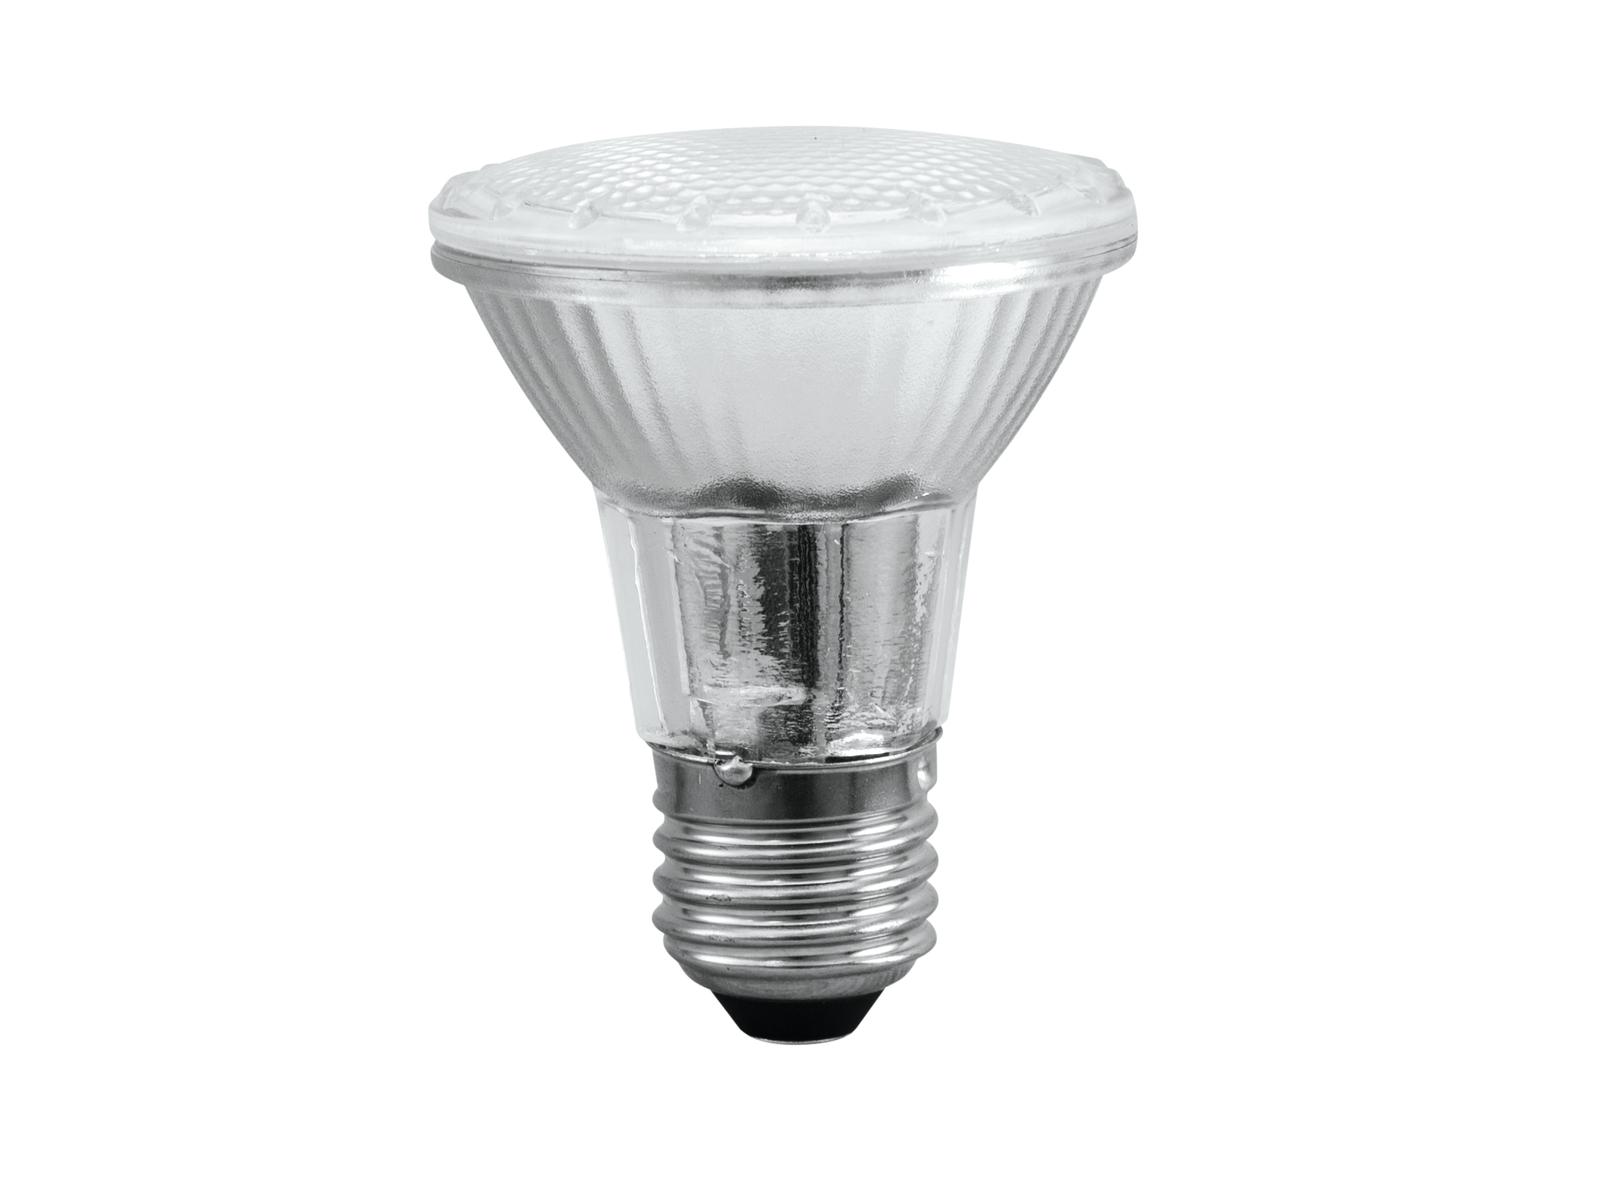 Lampada Faretto OMNILUX PAR-20 230V SMD 3W E-27 LED 3000K